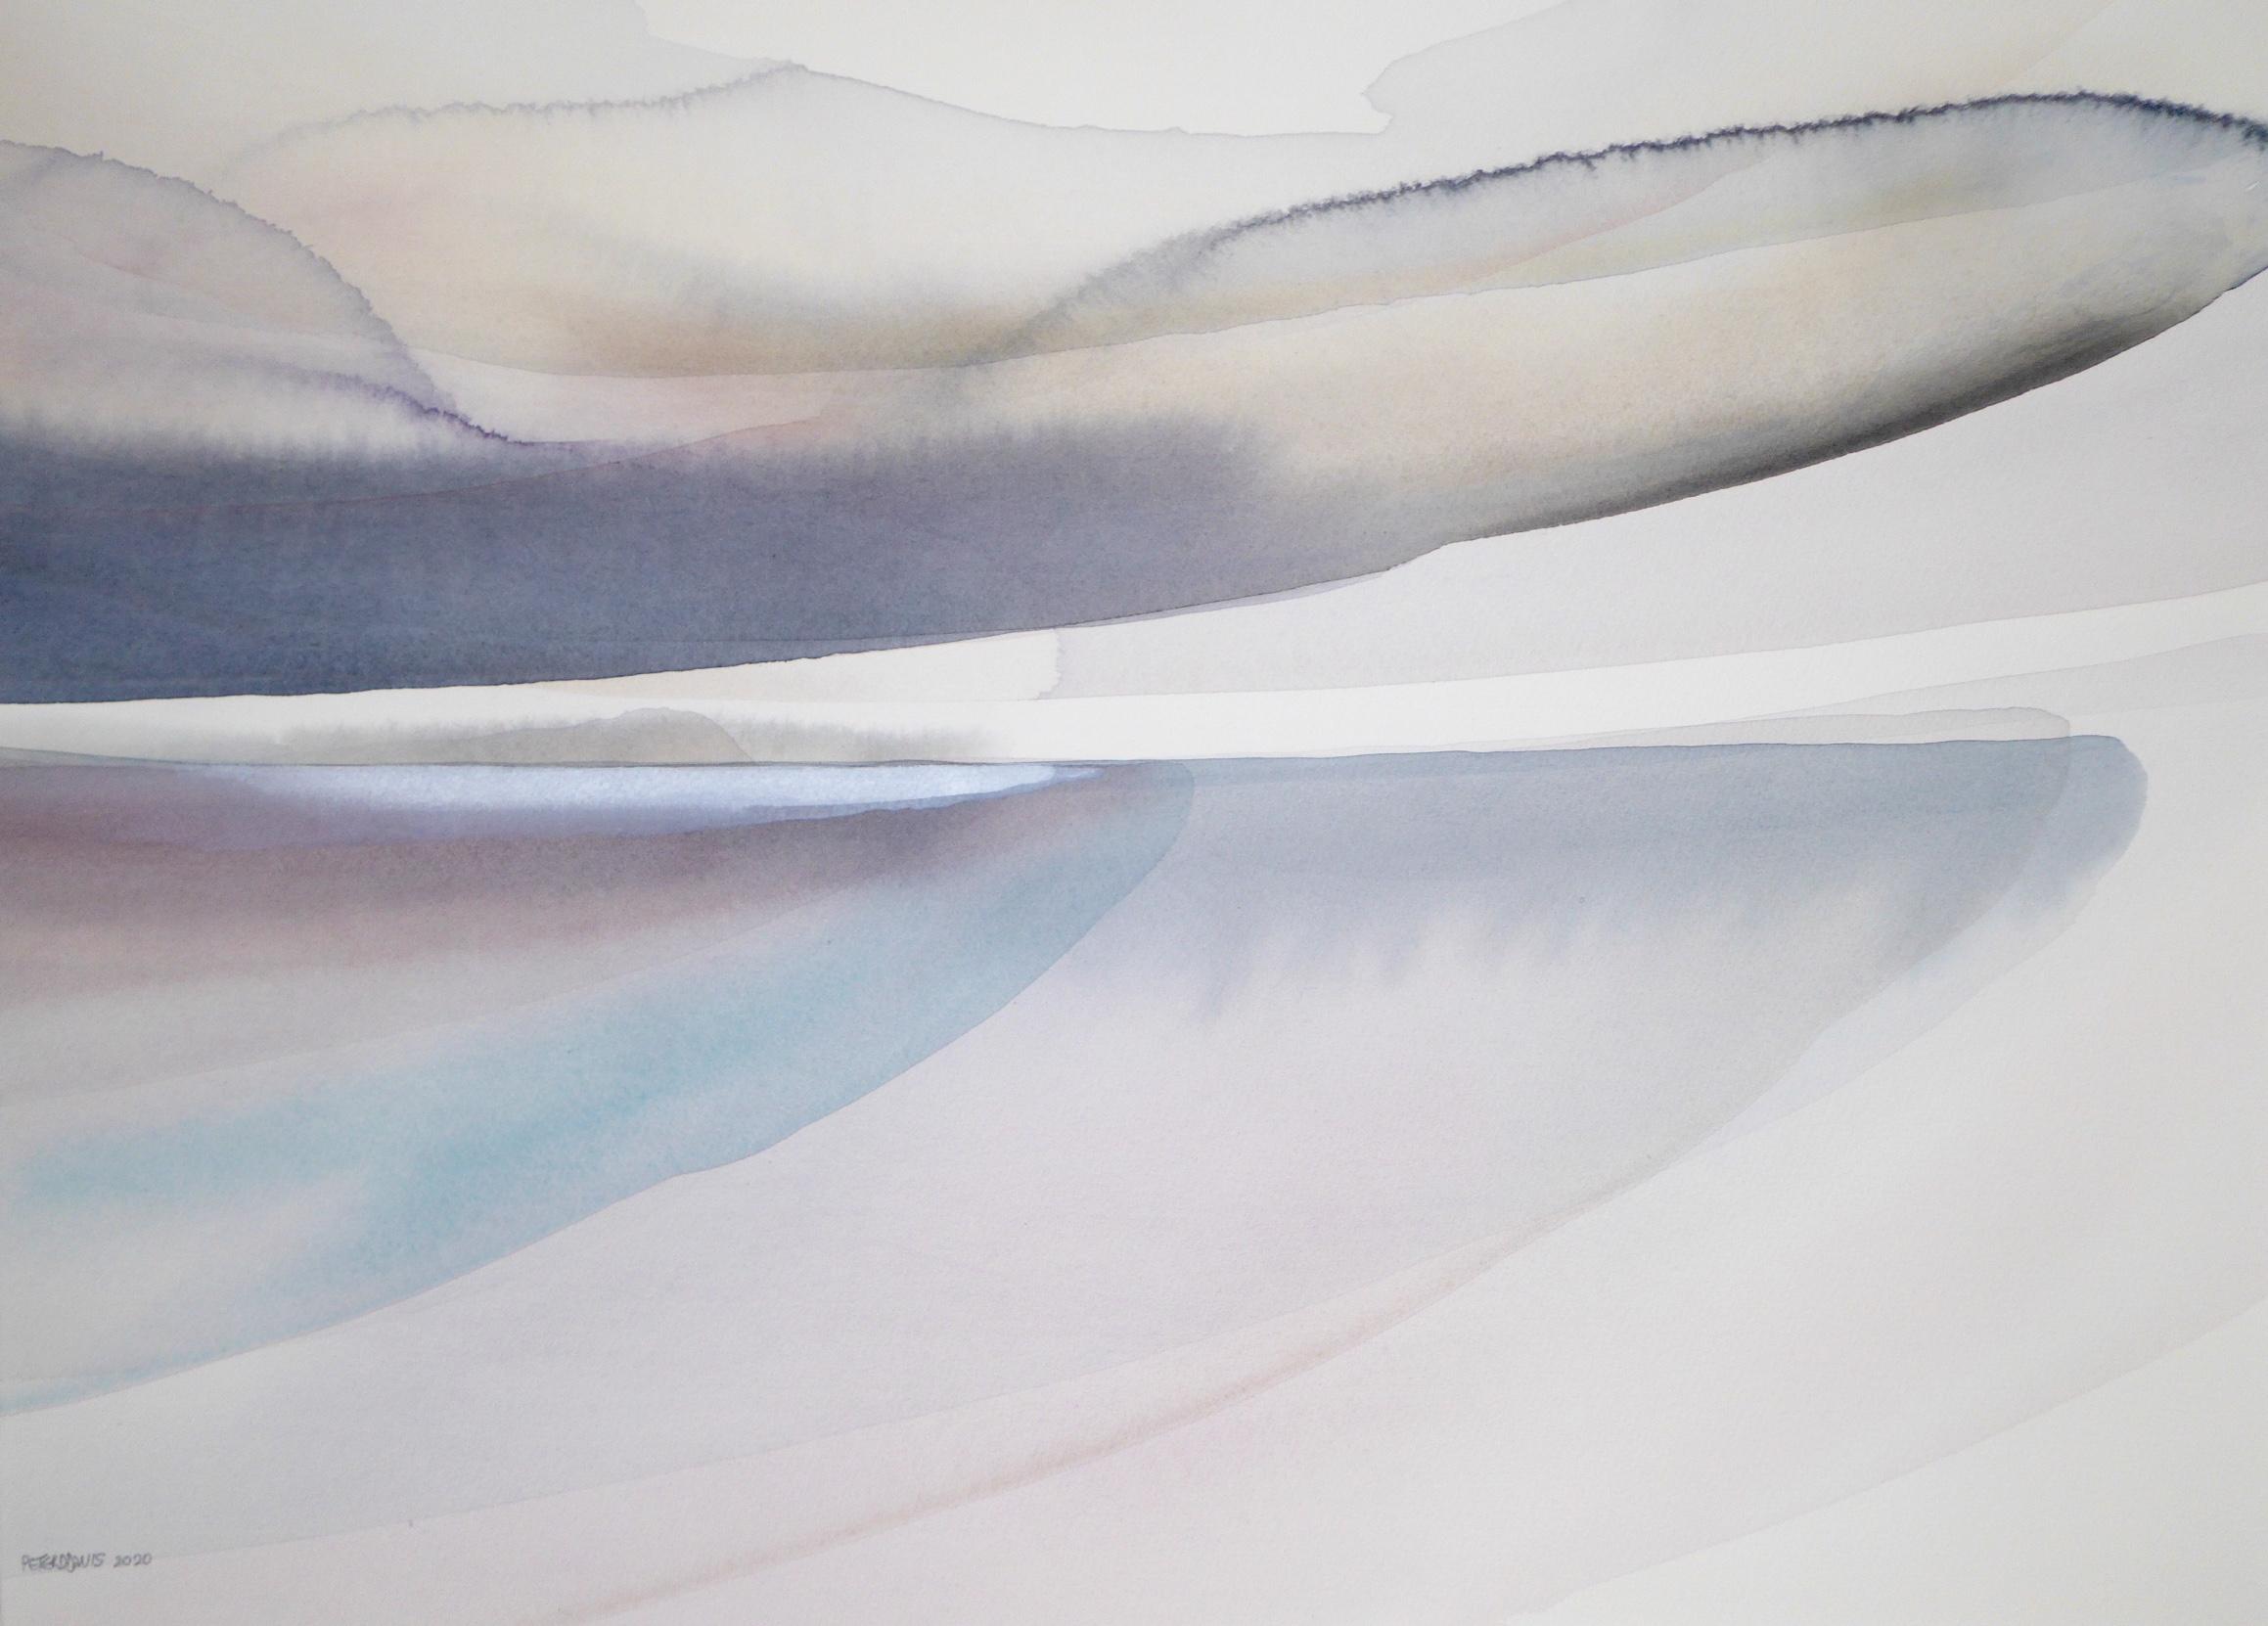 Peter Davis. Strange Light, May, Watercolour on paper 2020 (50x70cm)